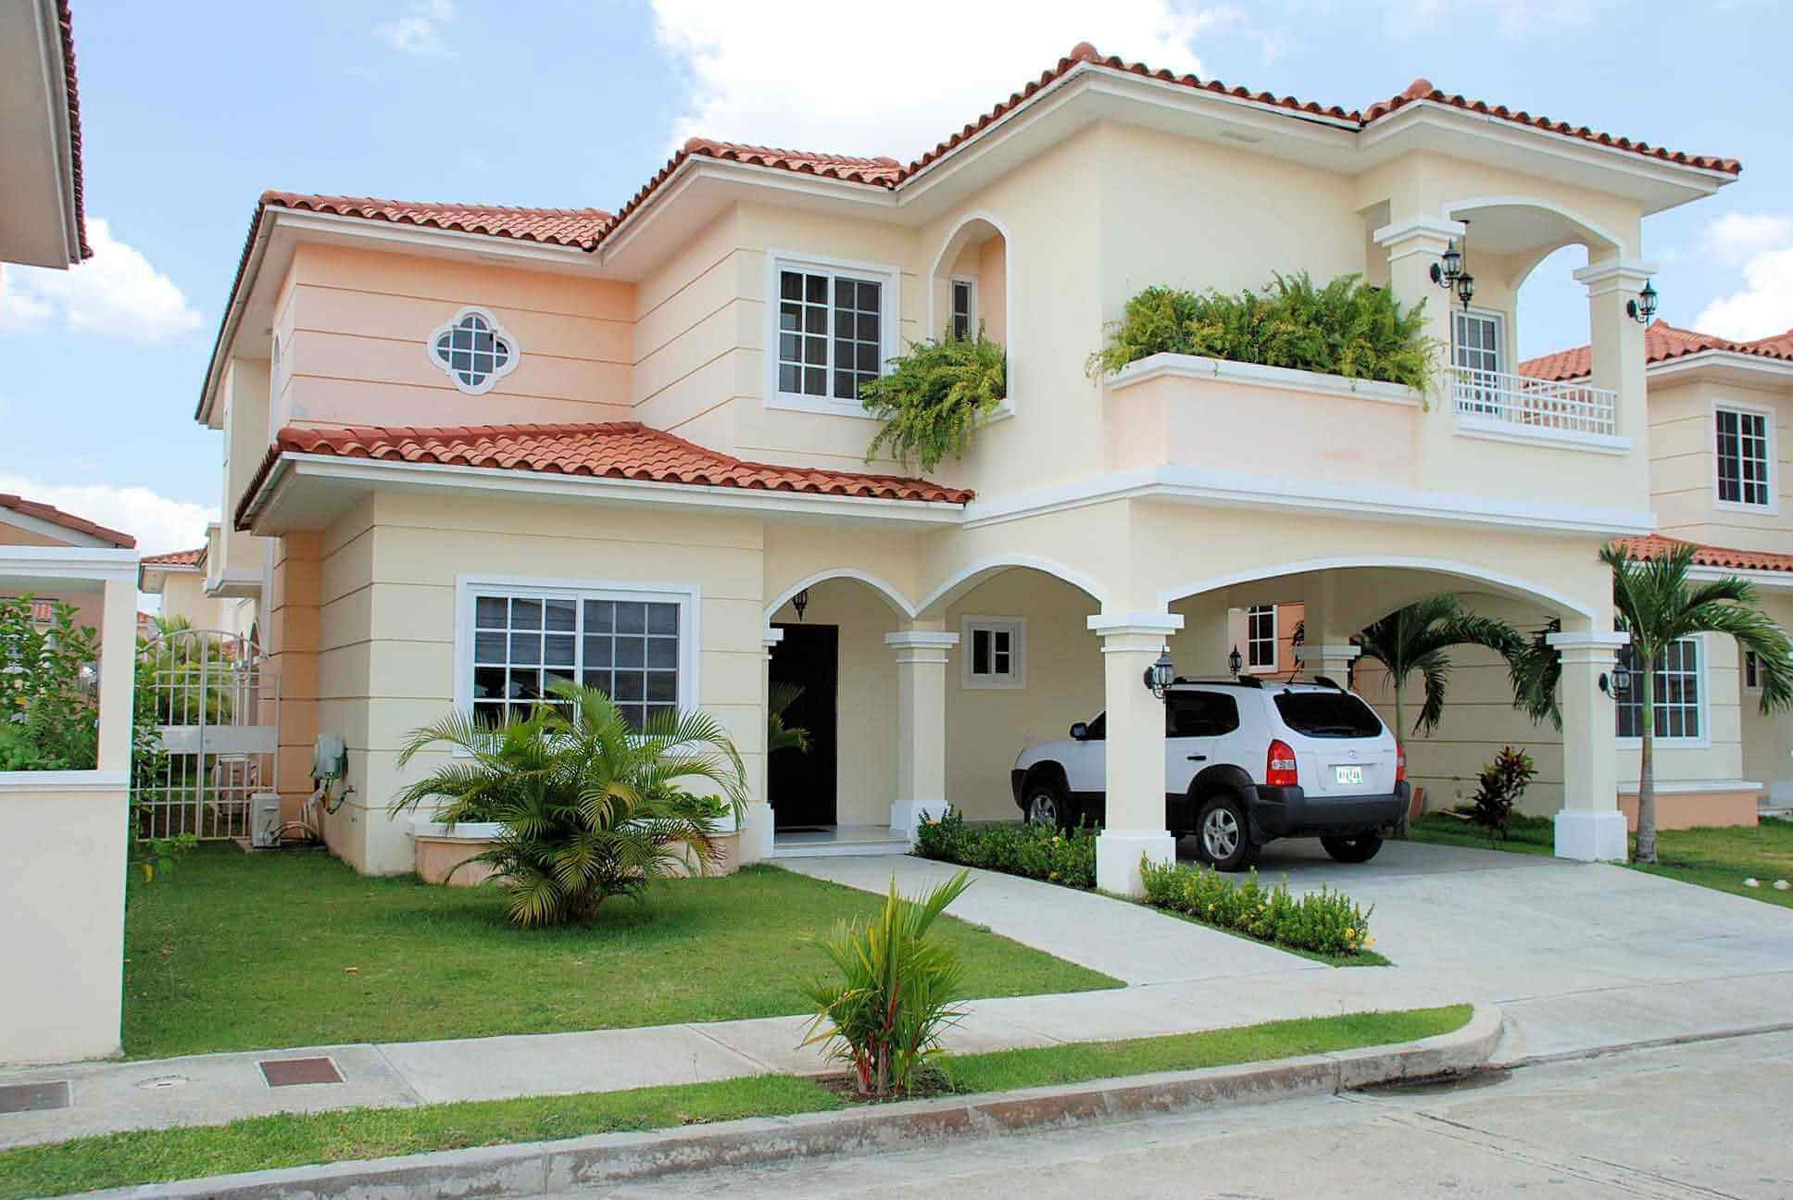 Alquiler de Casas en Panam  Casas Panam